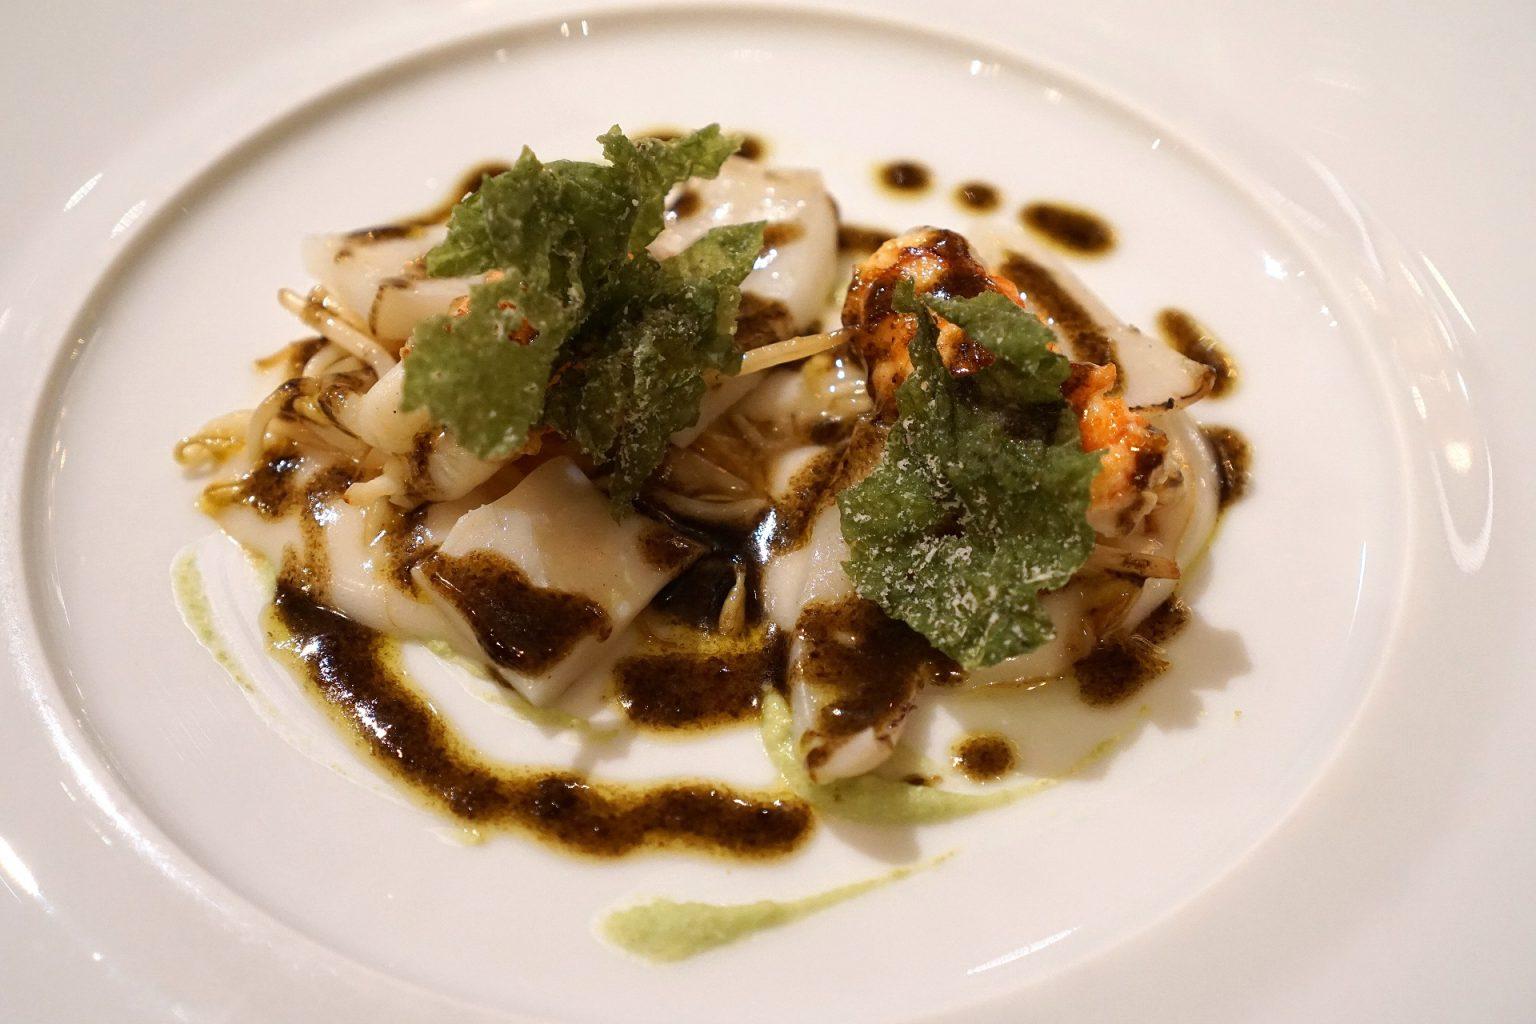 Perbellini, Isola, sushi